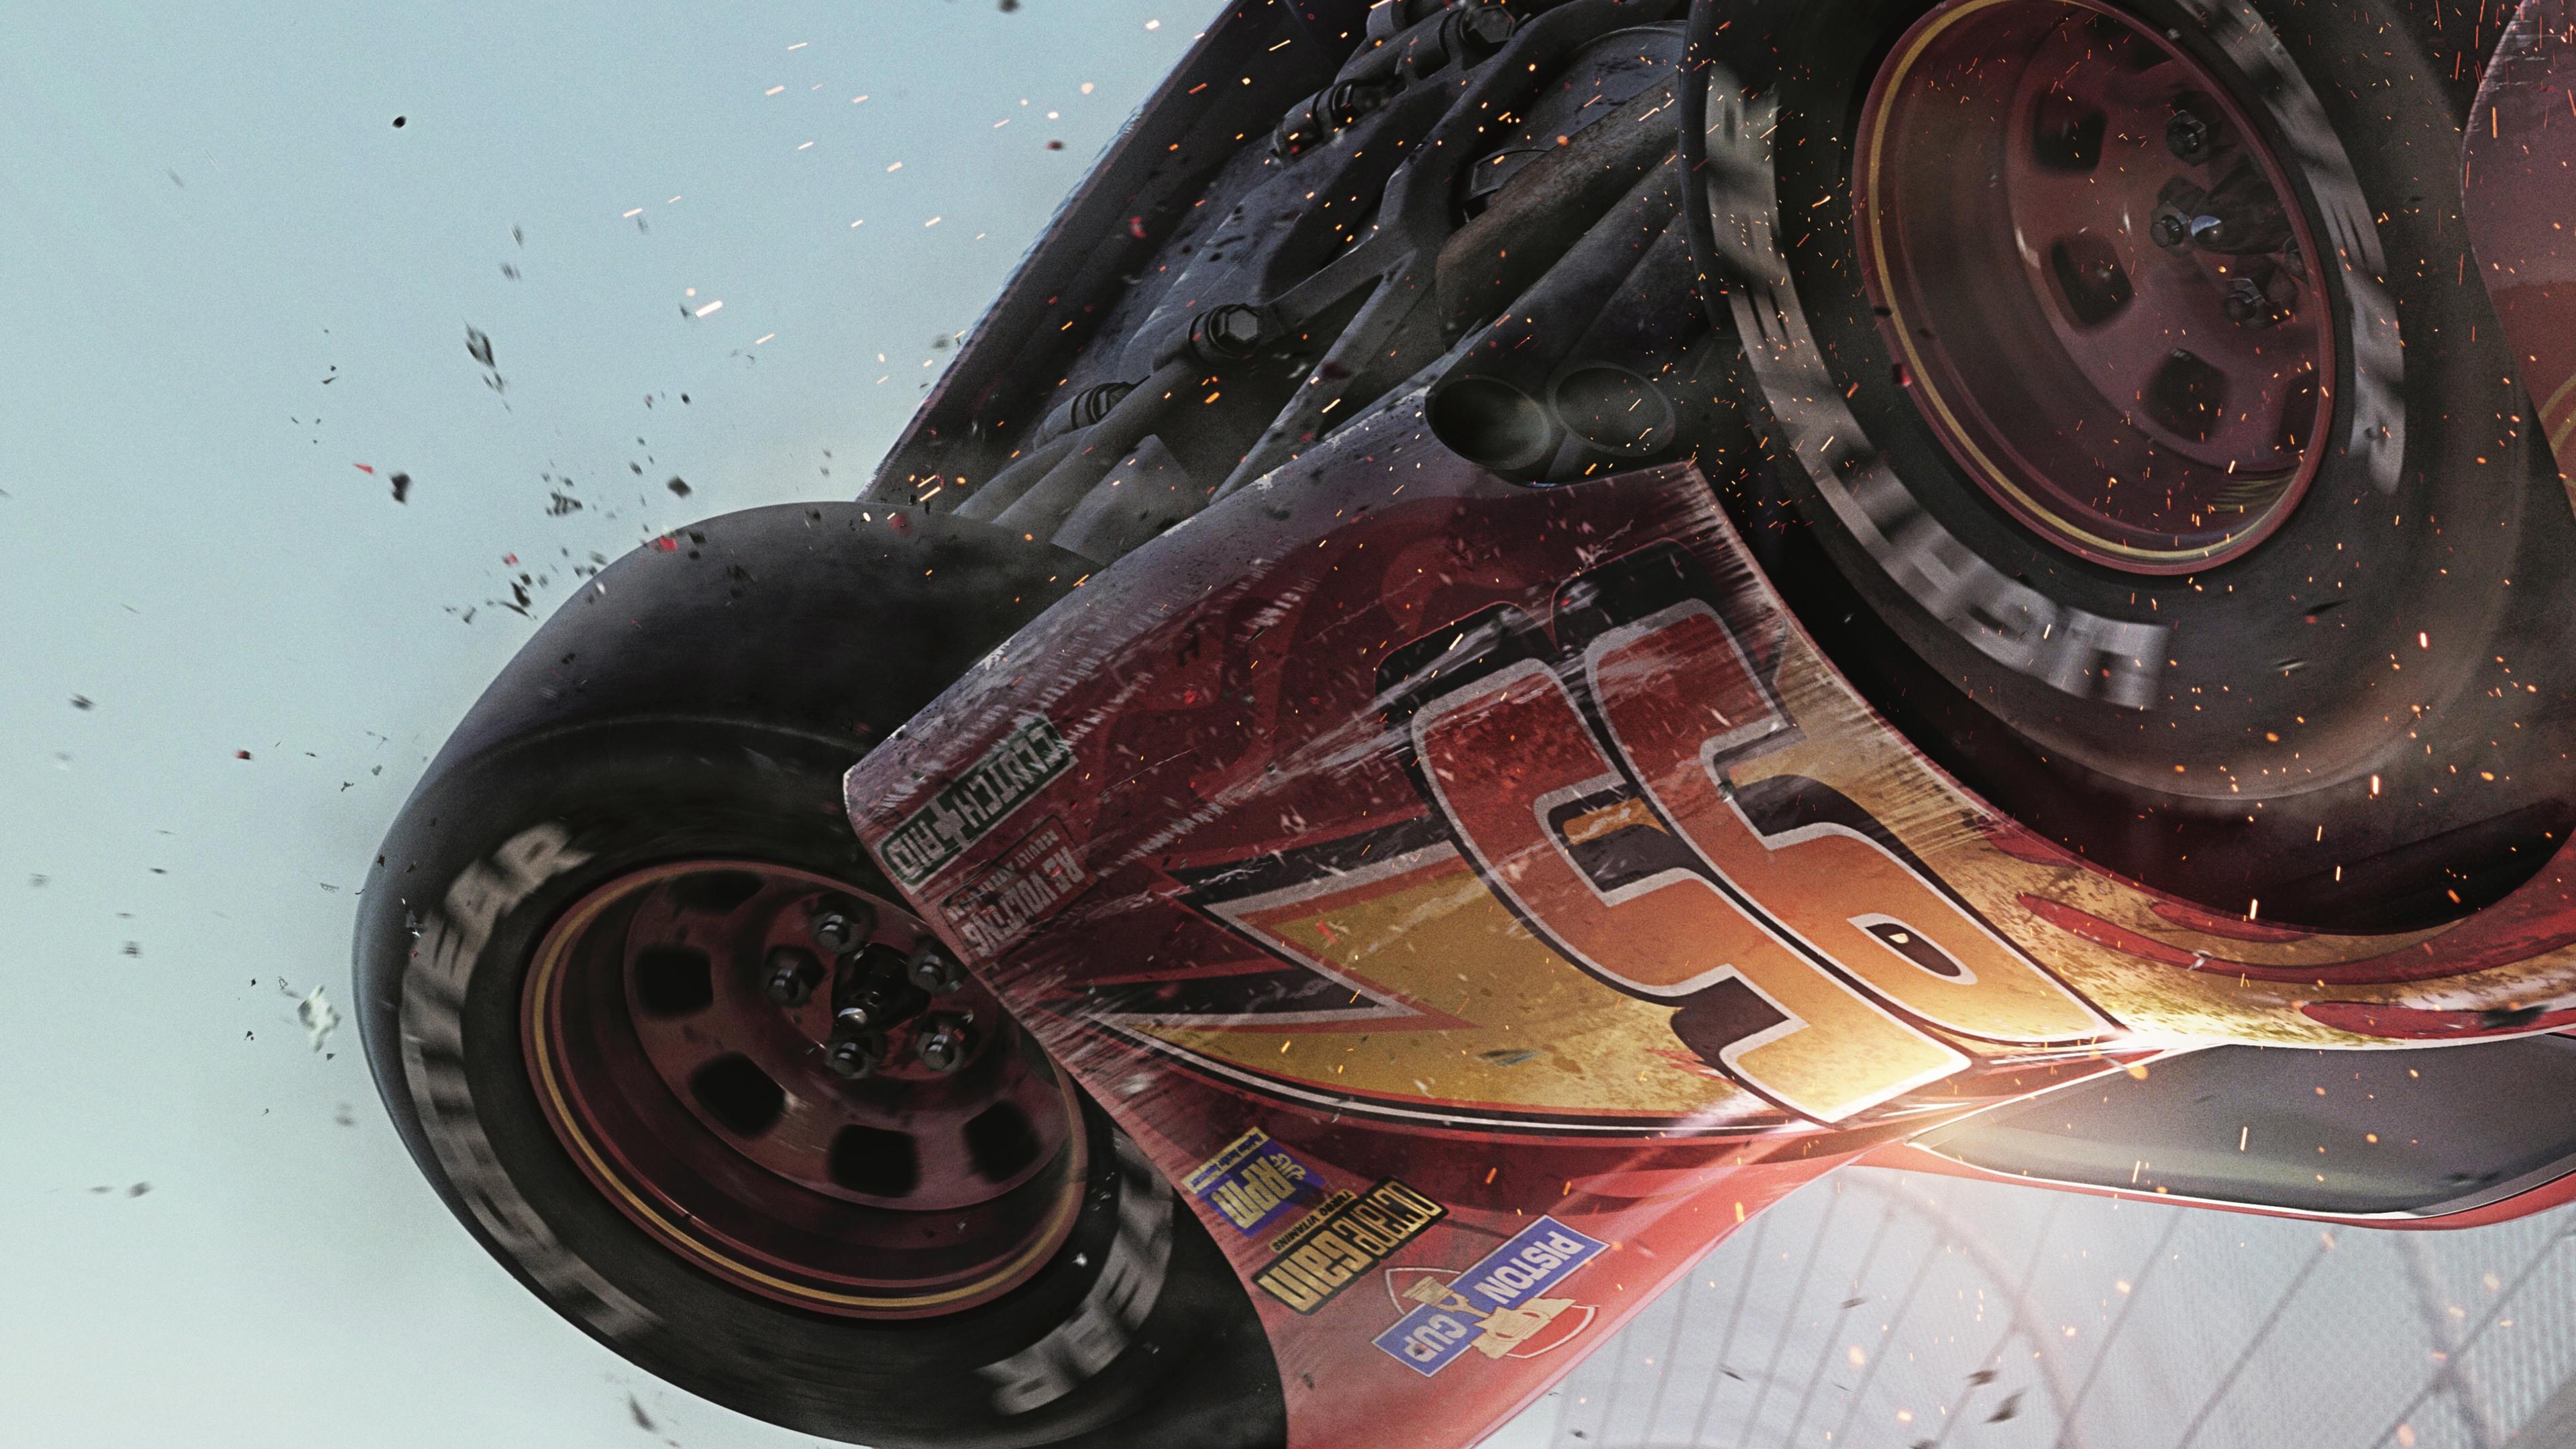 cars 3 2017 movie 1536401778 - Cars 3 2017 Movie - pixar wallpapers, hd-wallpapers, cars 3 wallpapers, animated movies wallpapers, 5k wallpapers, 4k-wallpapers, 2017 movies wallpapers